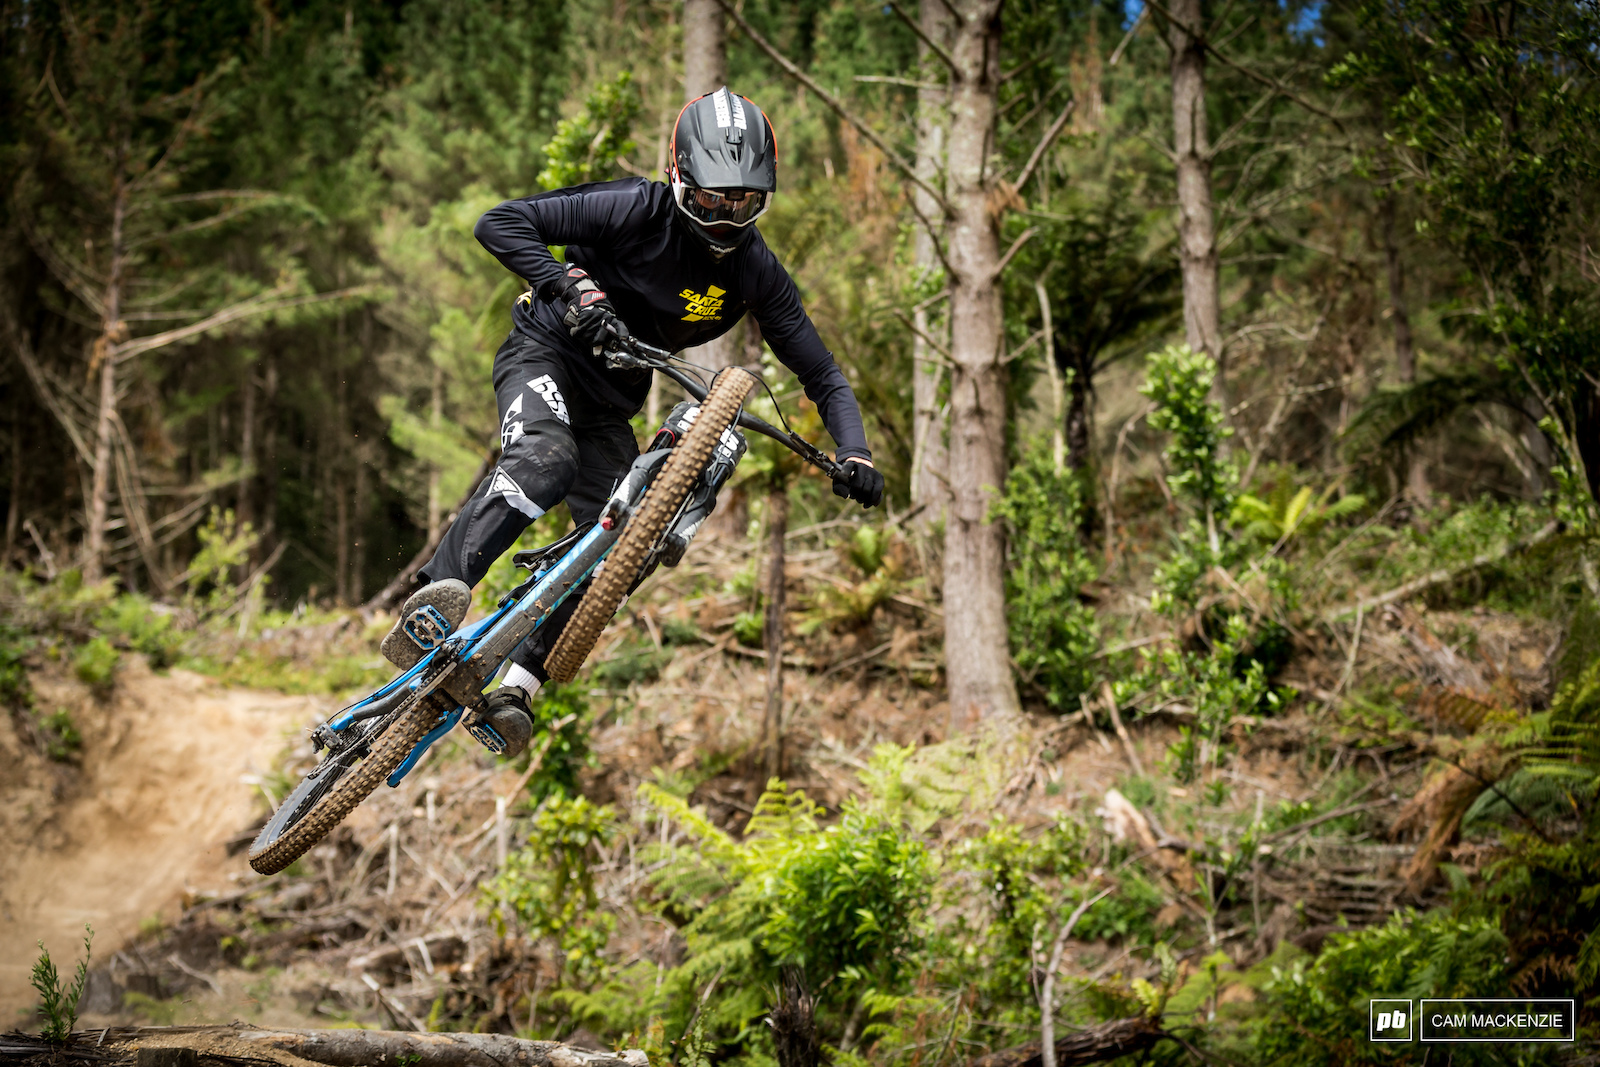 Crankworx Rotorua Redwoods DH 2018